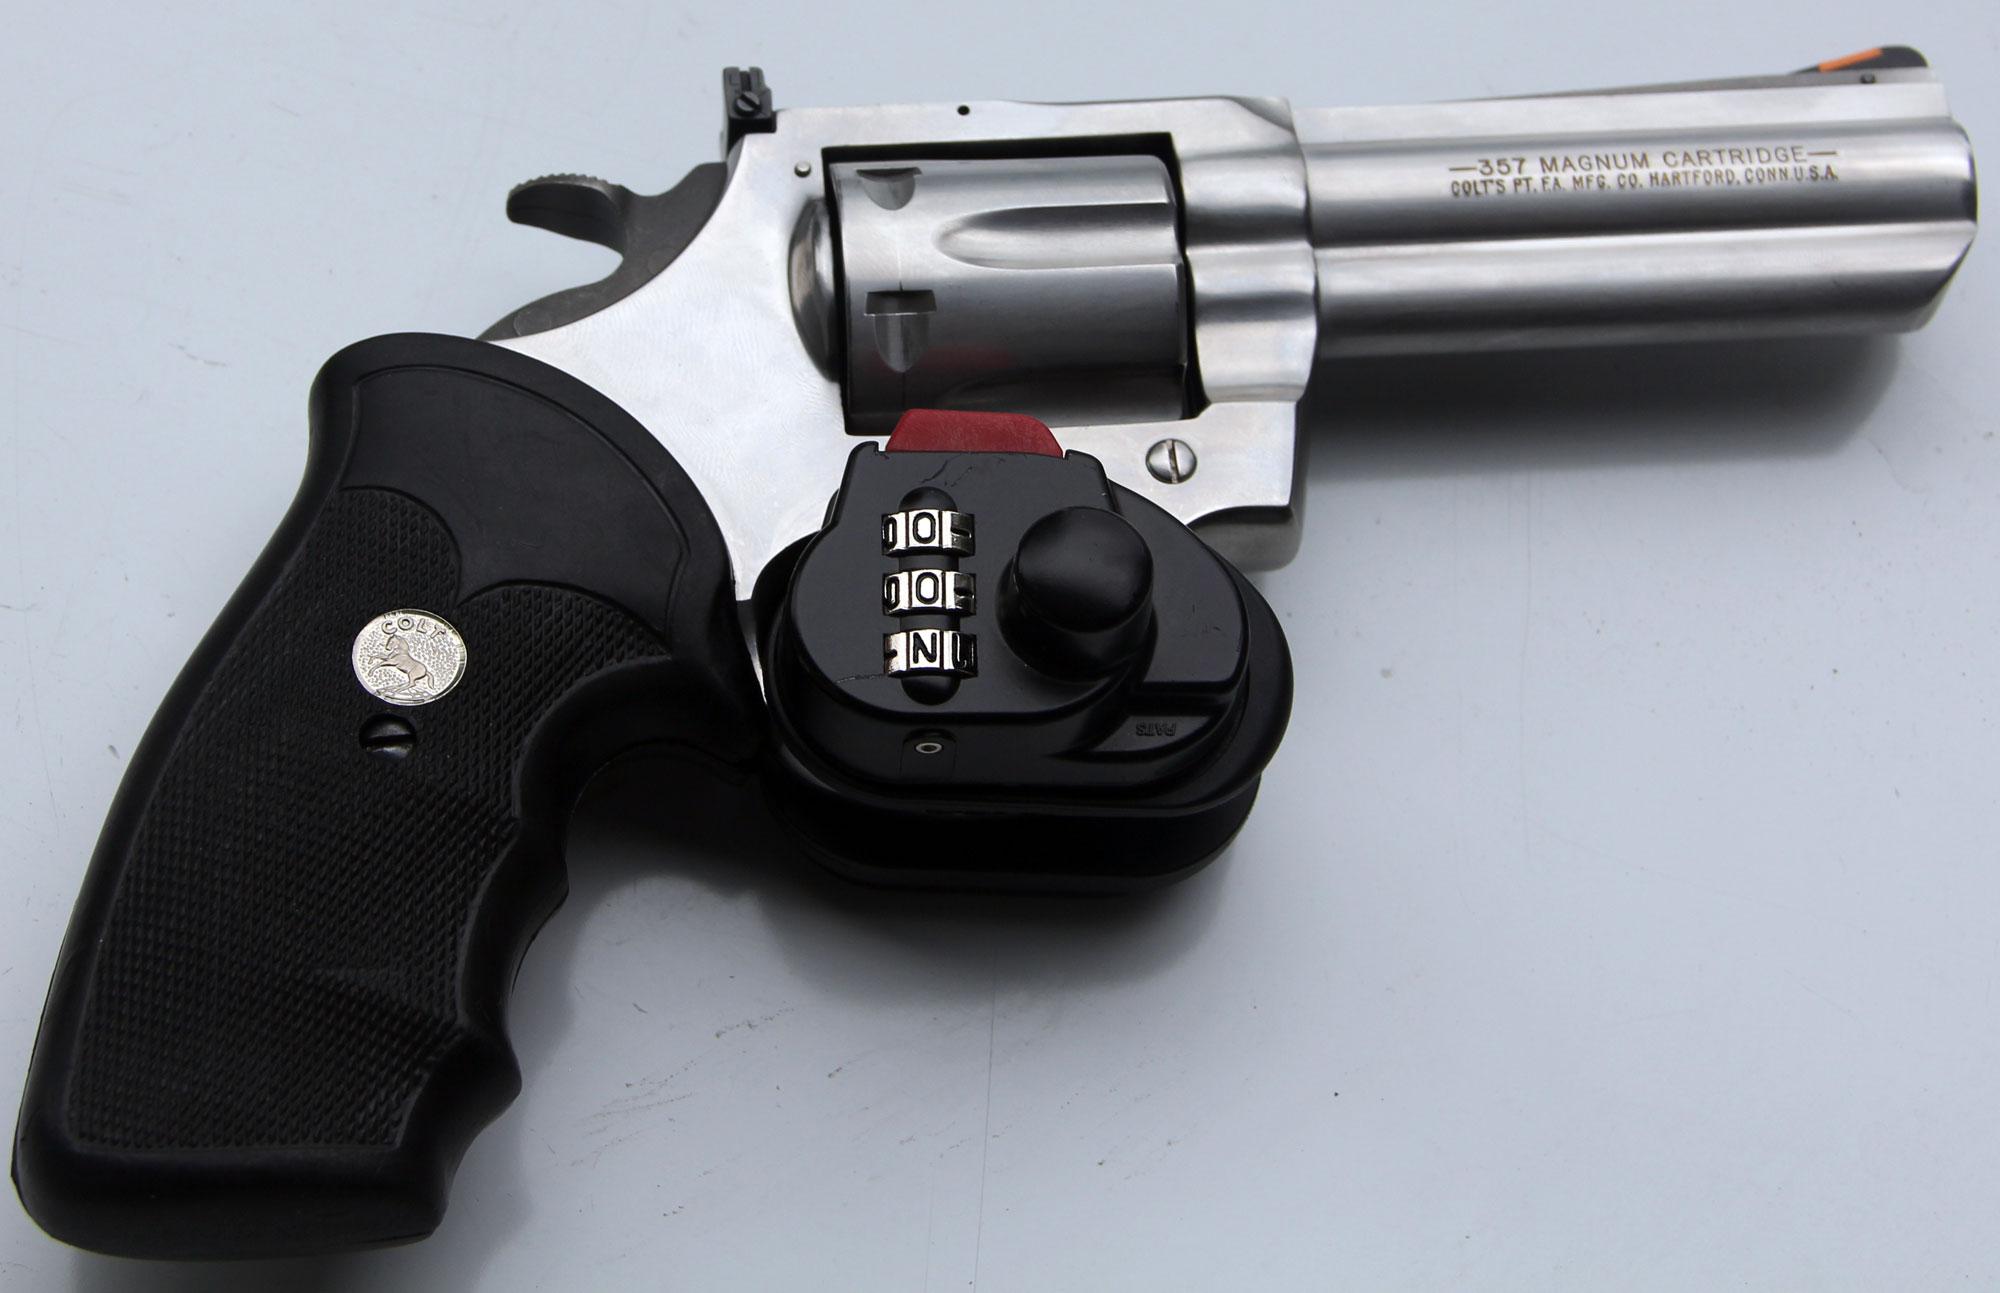 Combination Trigger Locks on Ratchet Mechanism